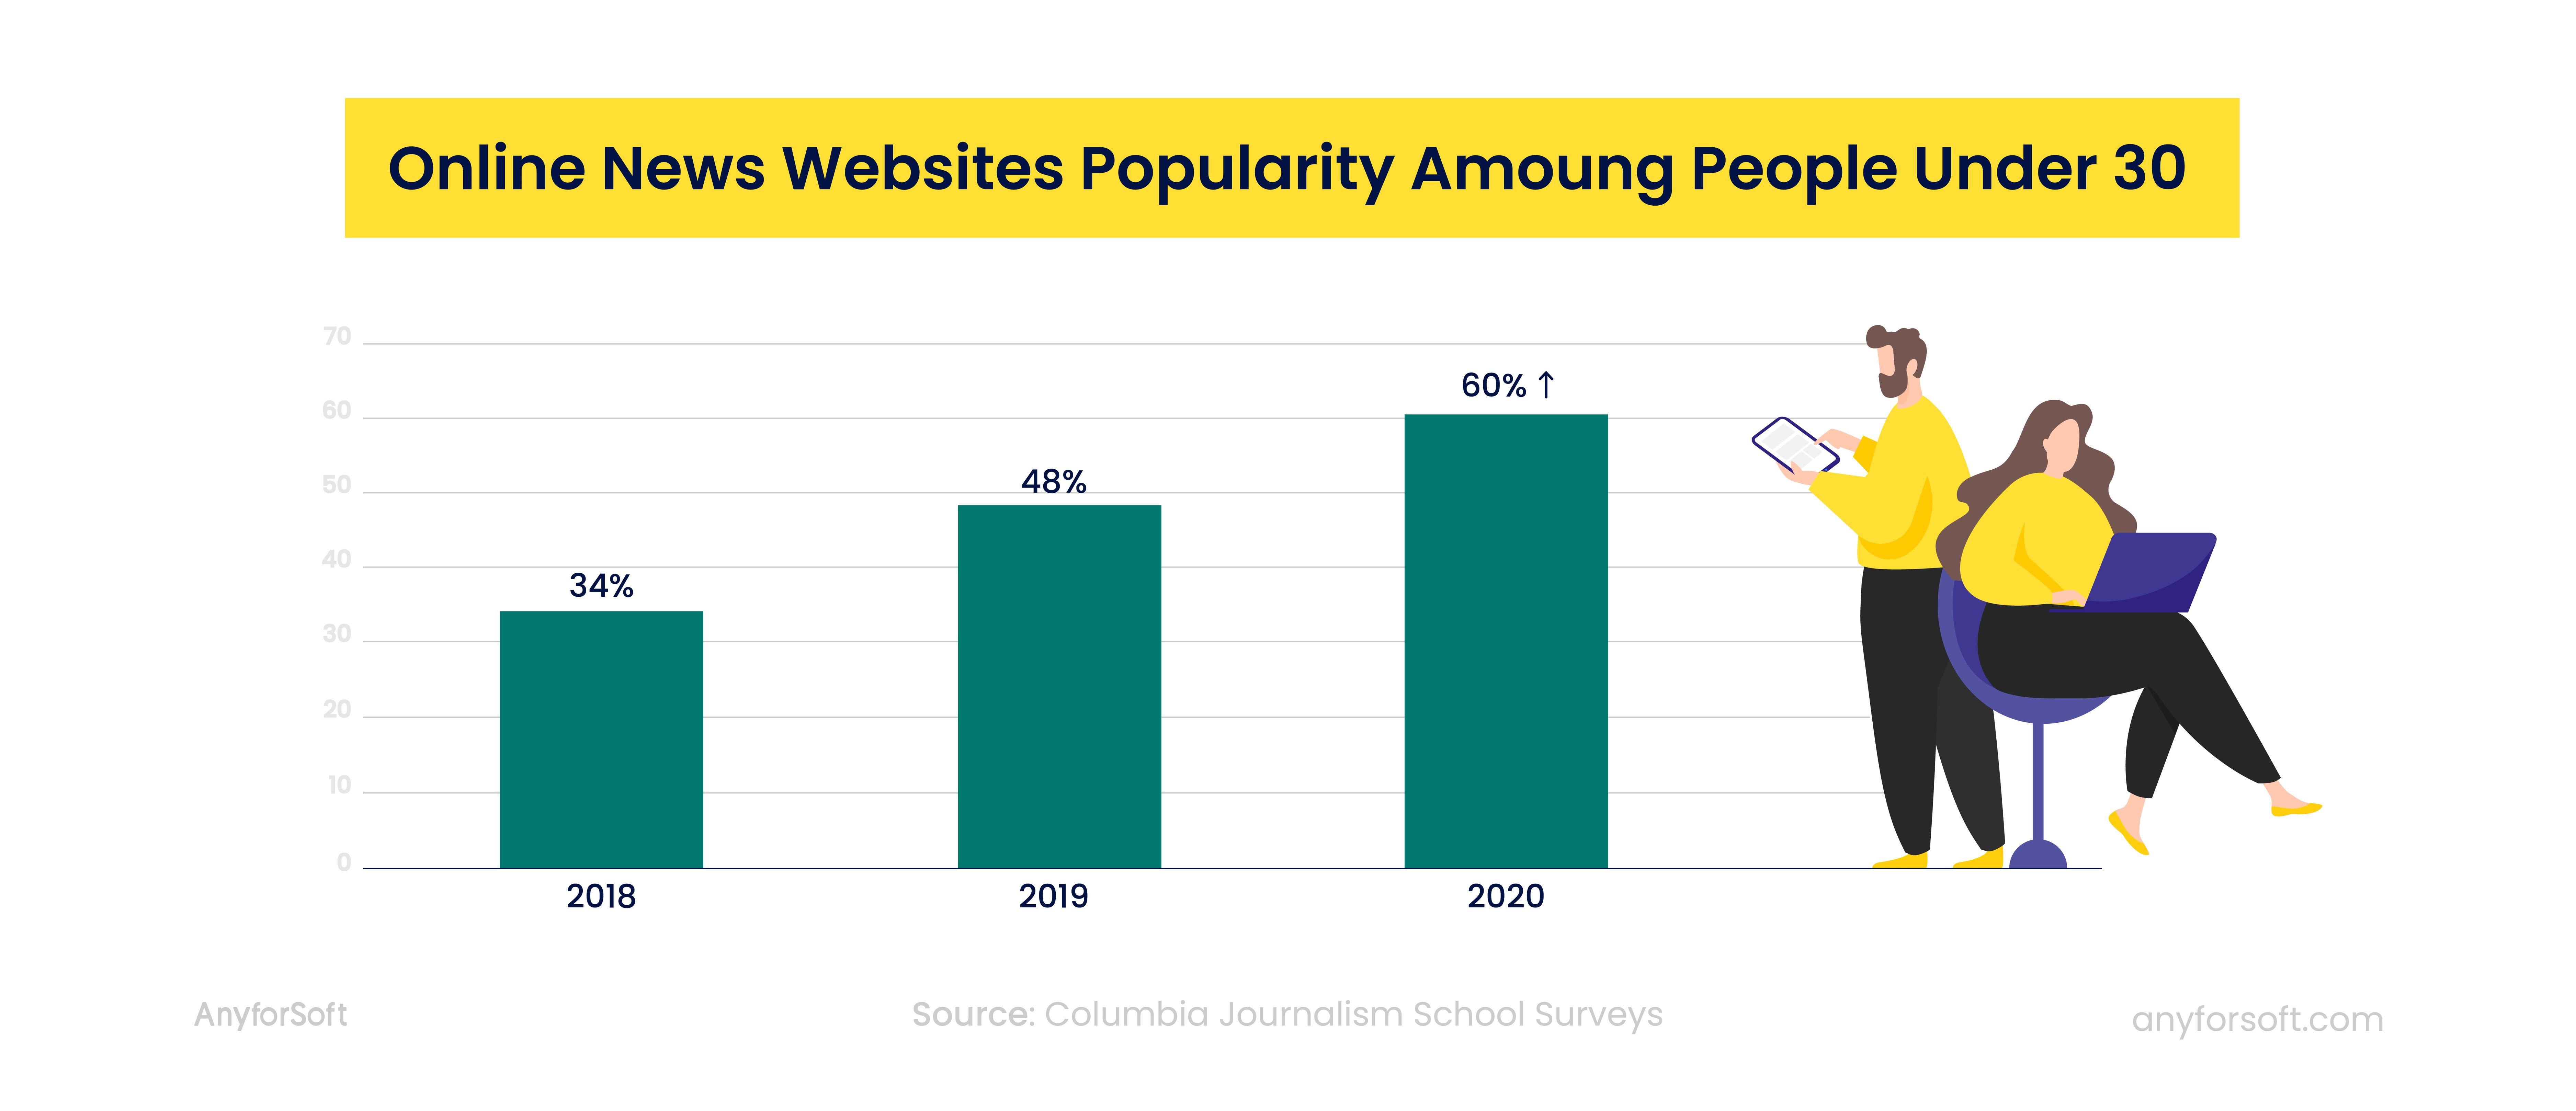 online news websites popularity among people under 30